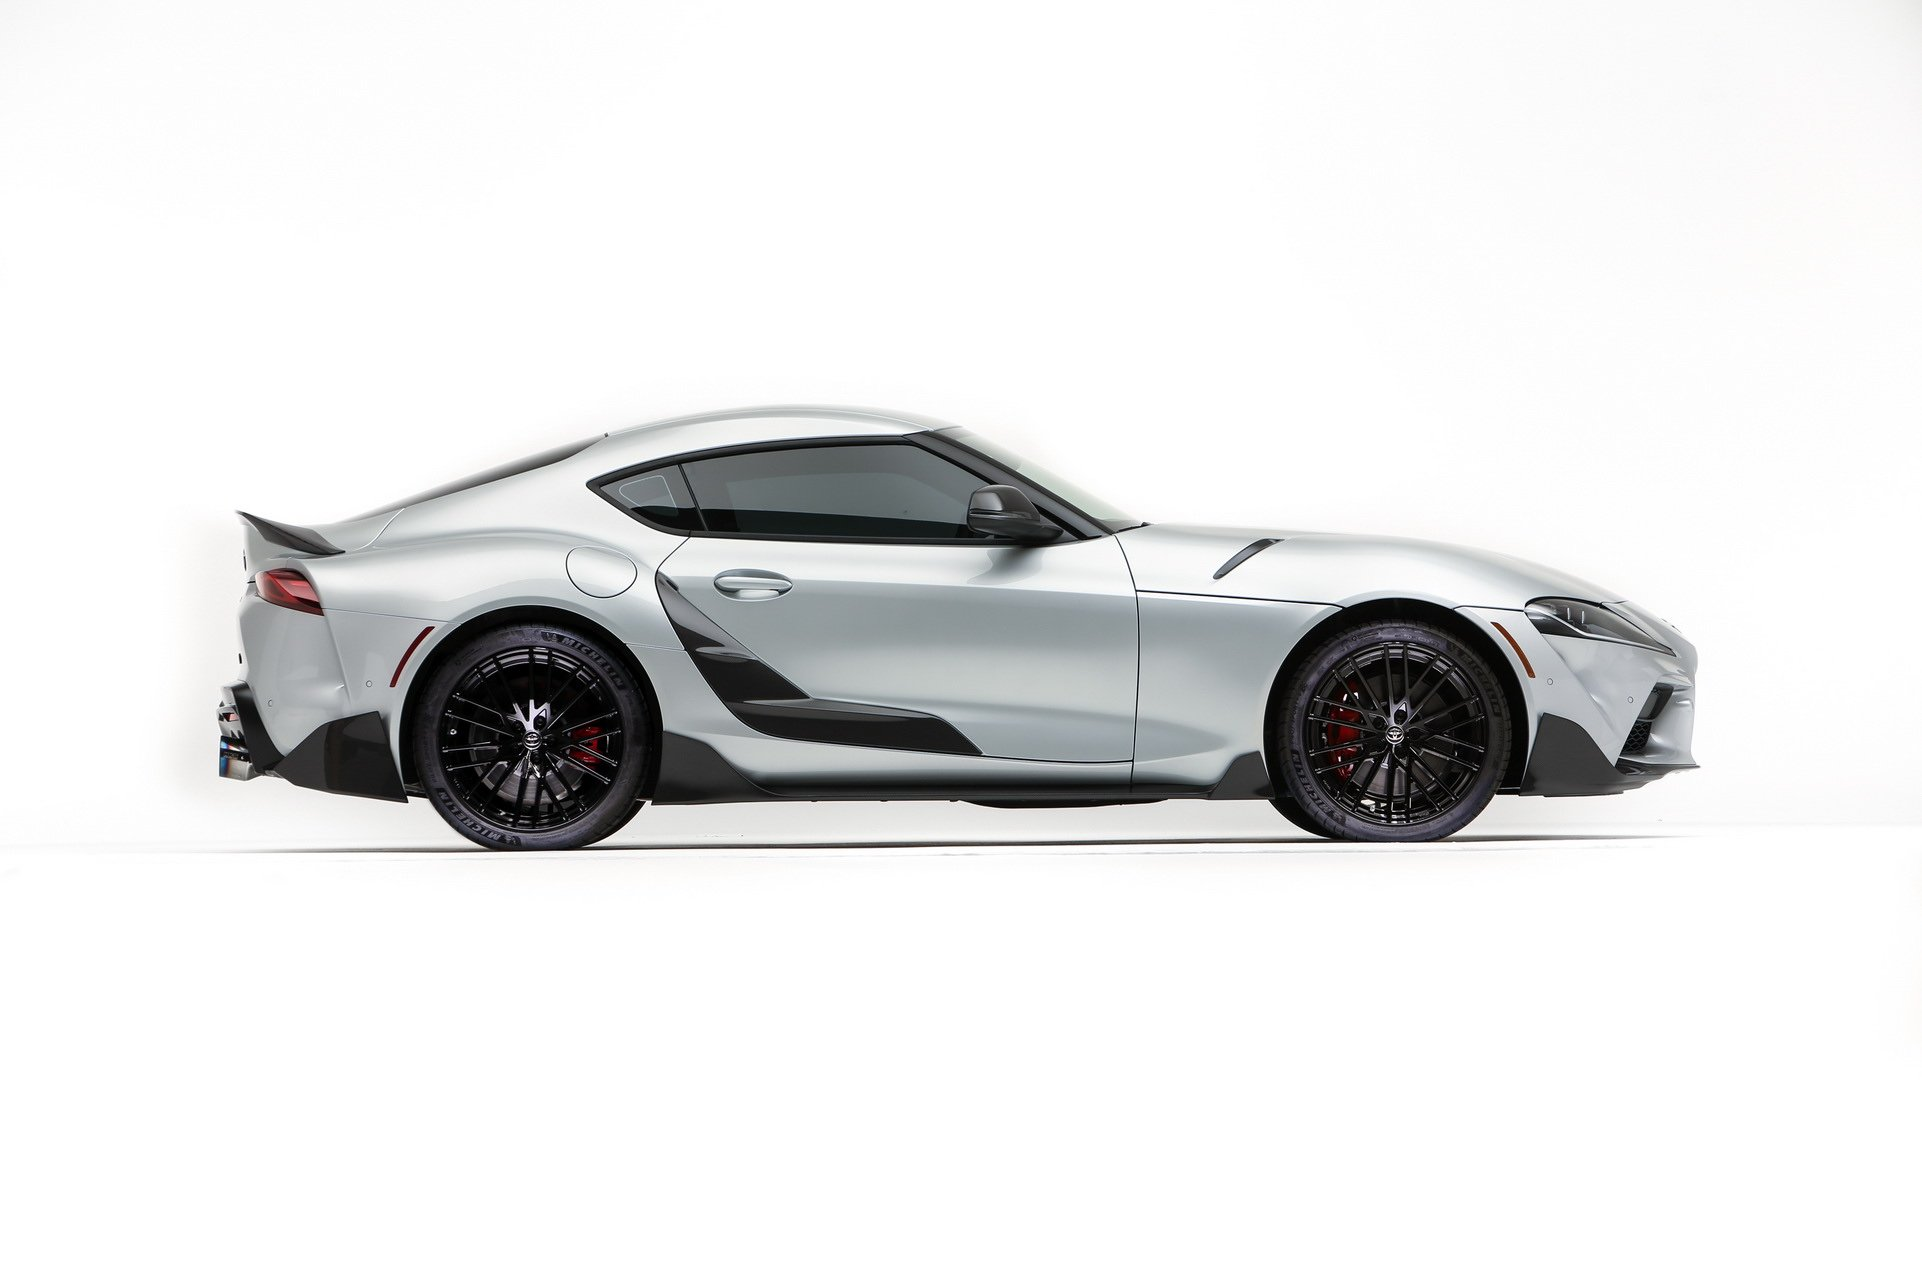 2020-Toyota-GR-Supra-Performance-Line-Concept9